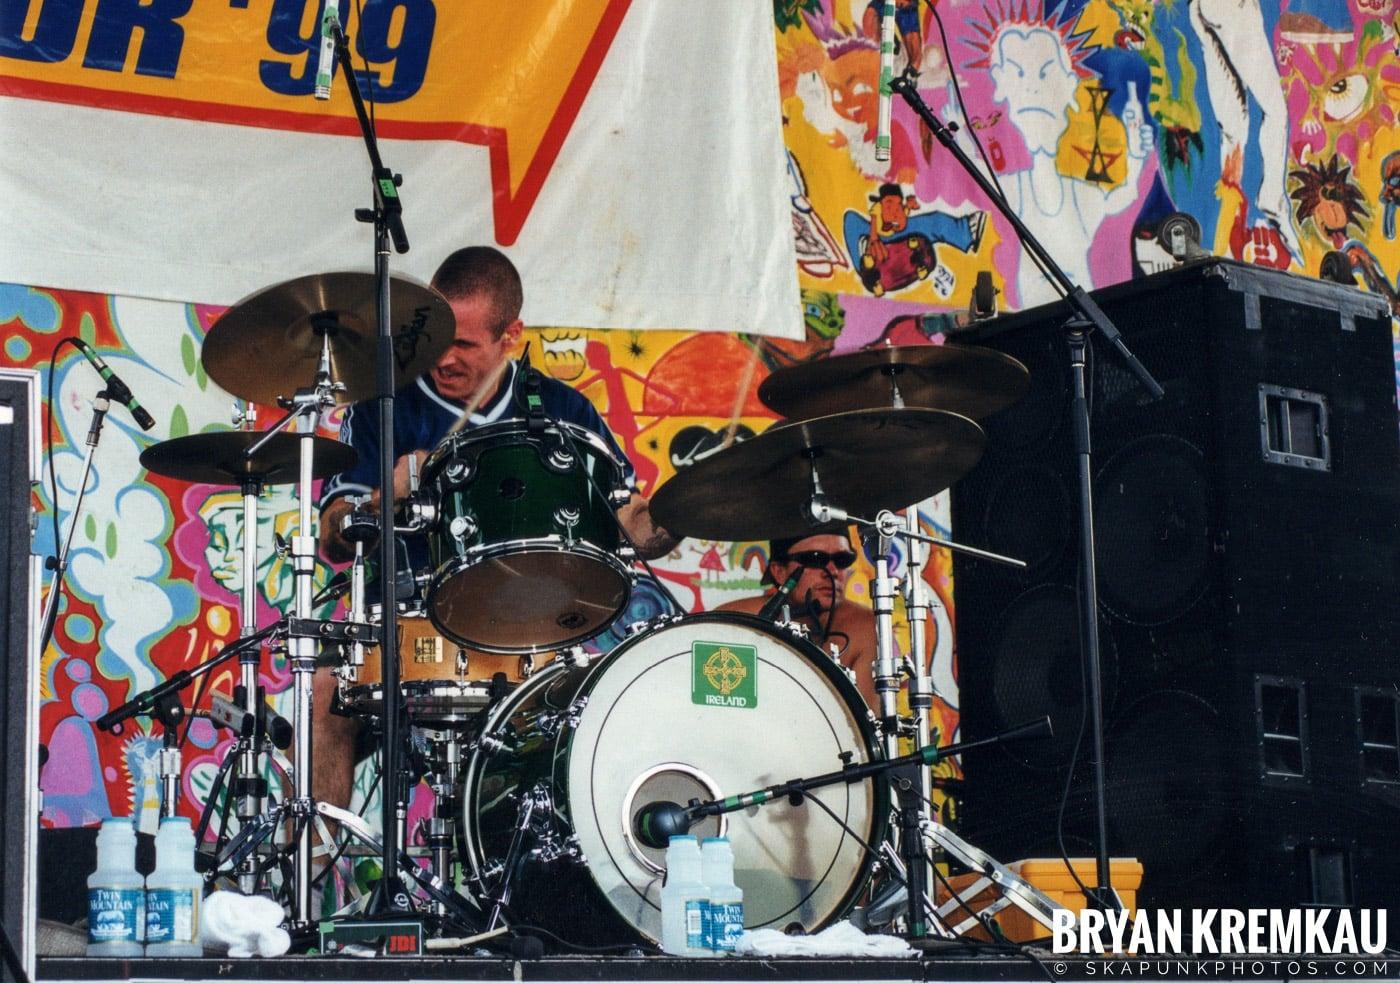 The Dropkick Murphys @ Vans Warped Tour, Randall's Island, NYC - 7.16.99 (13)